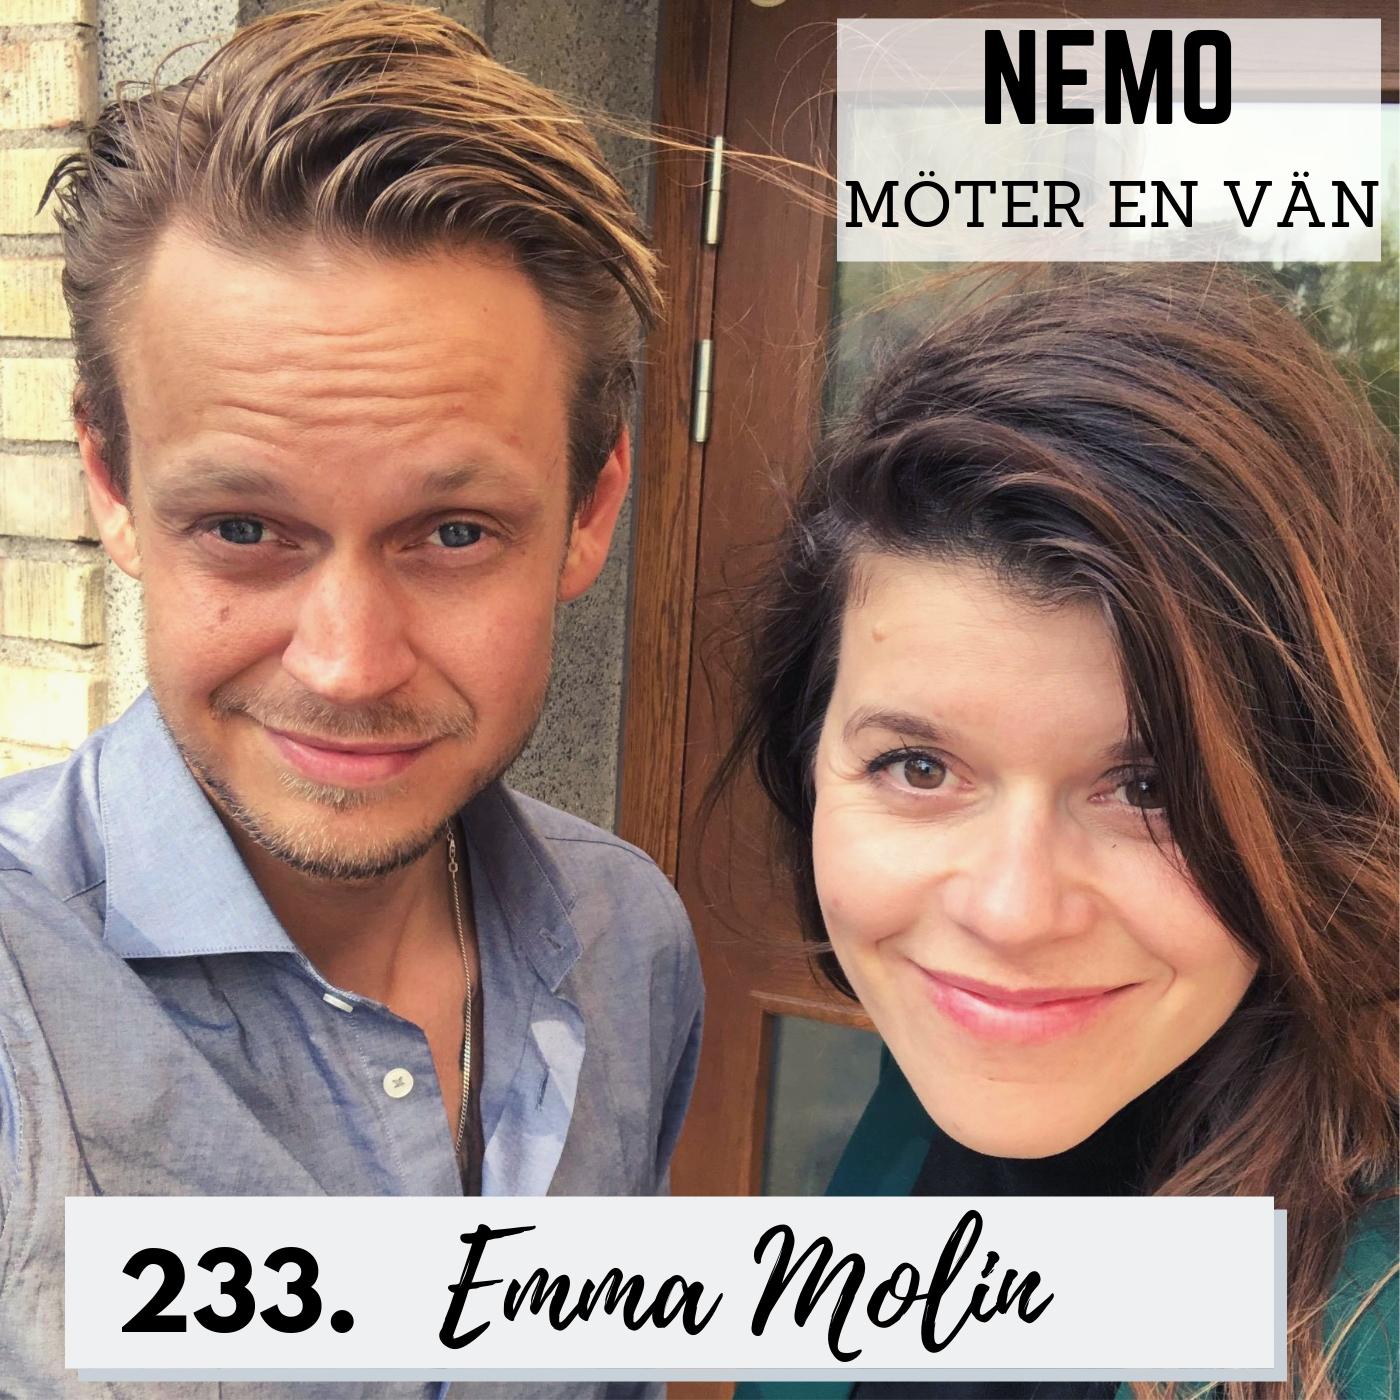 Nemo möter podcast